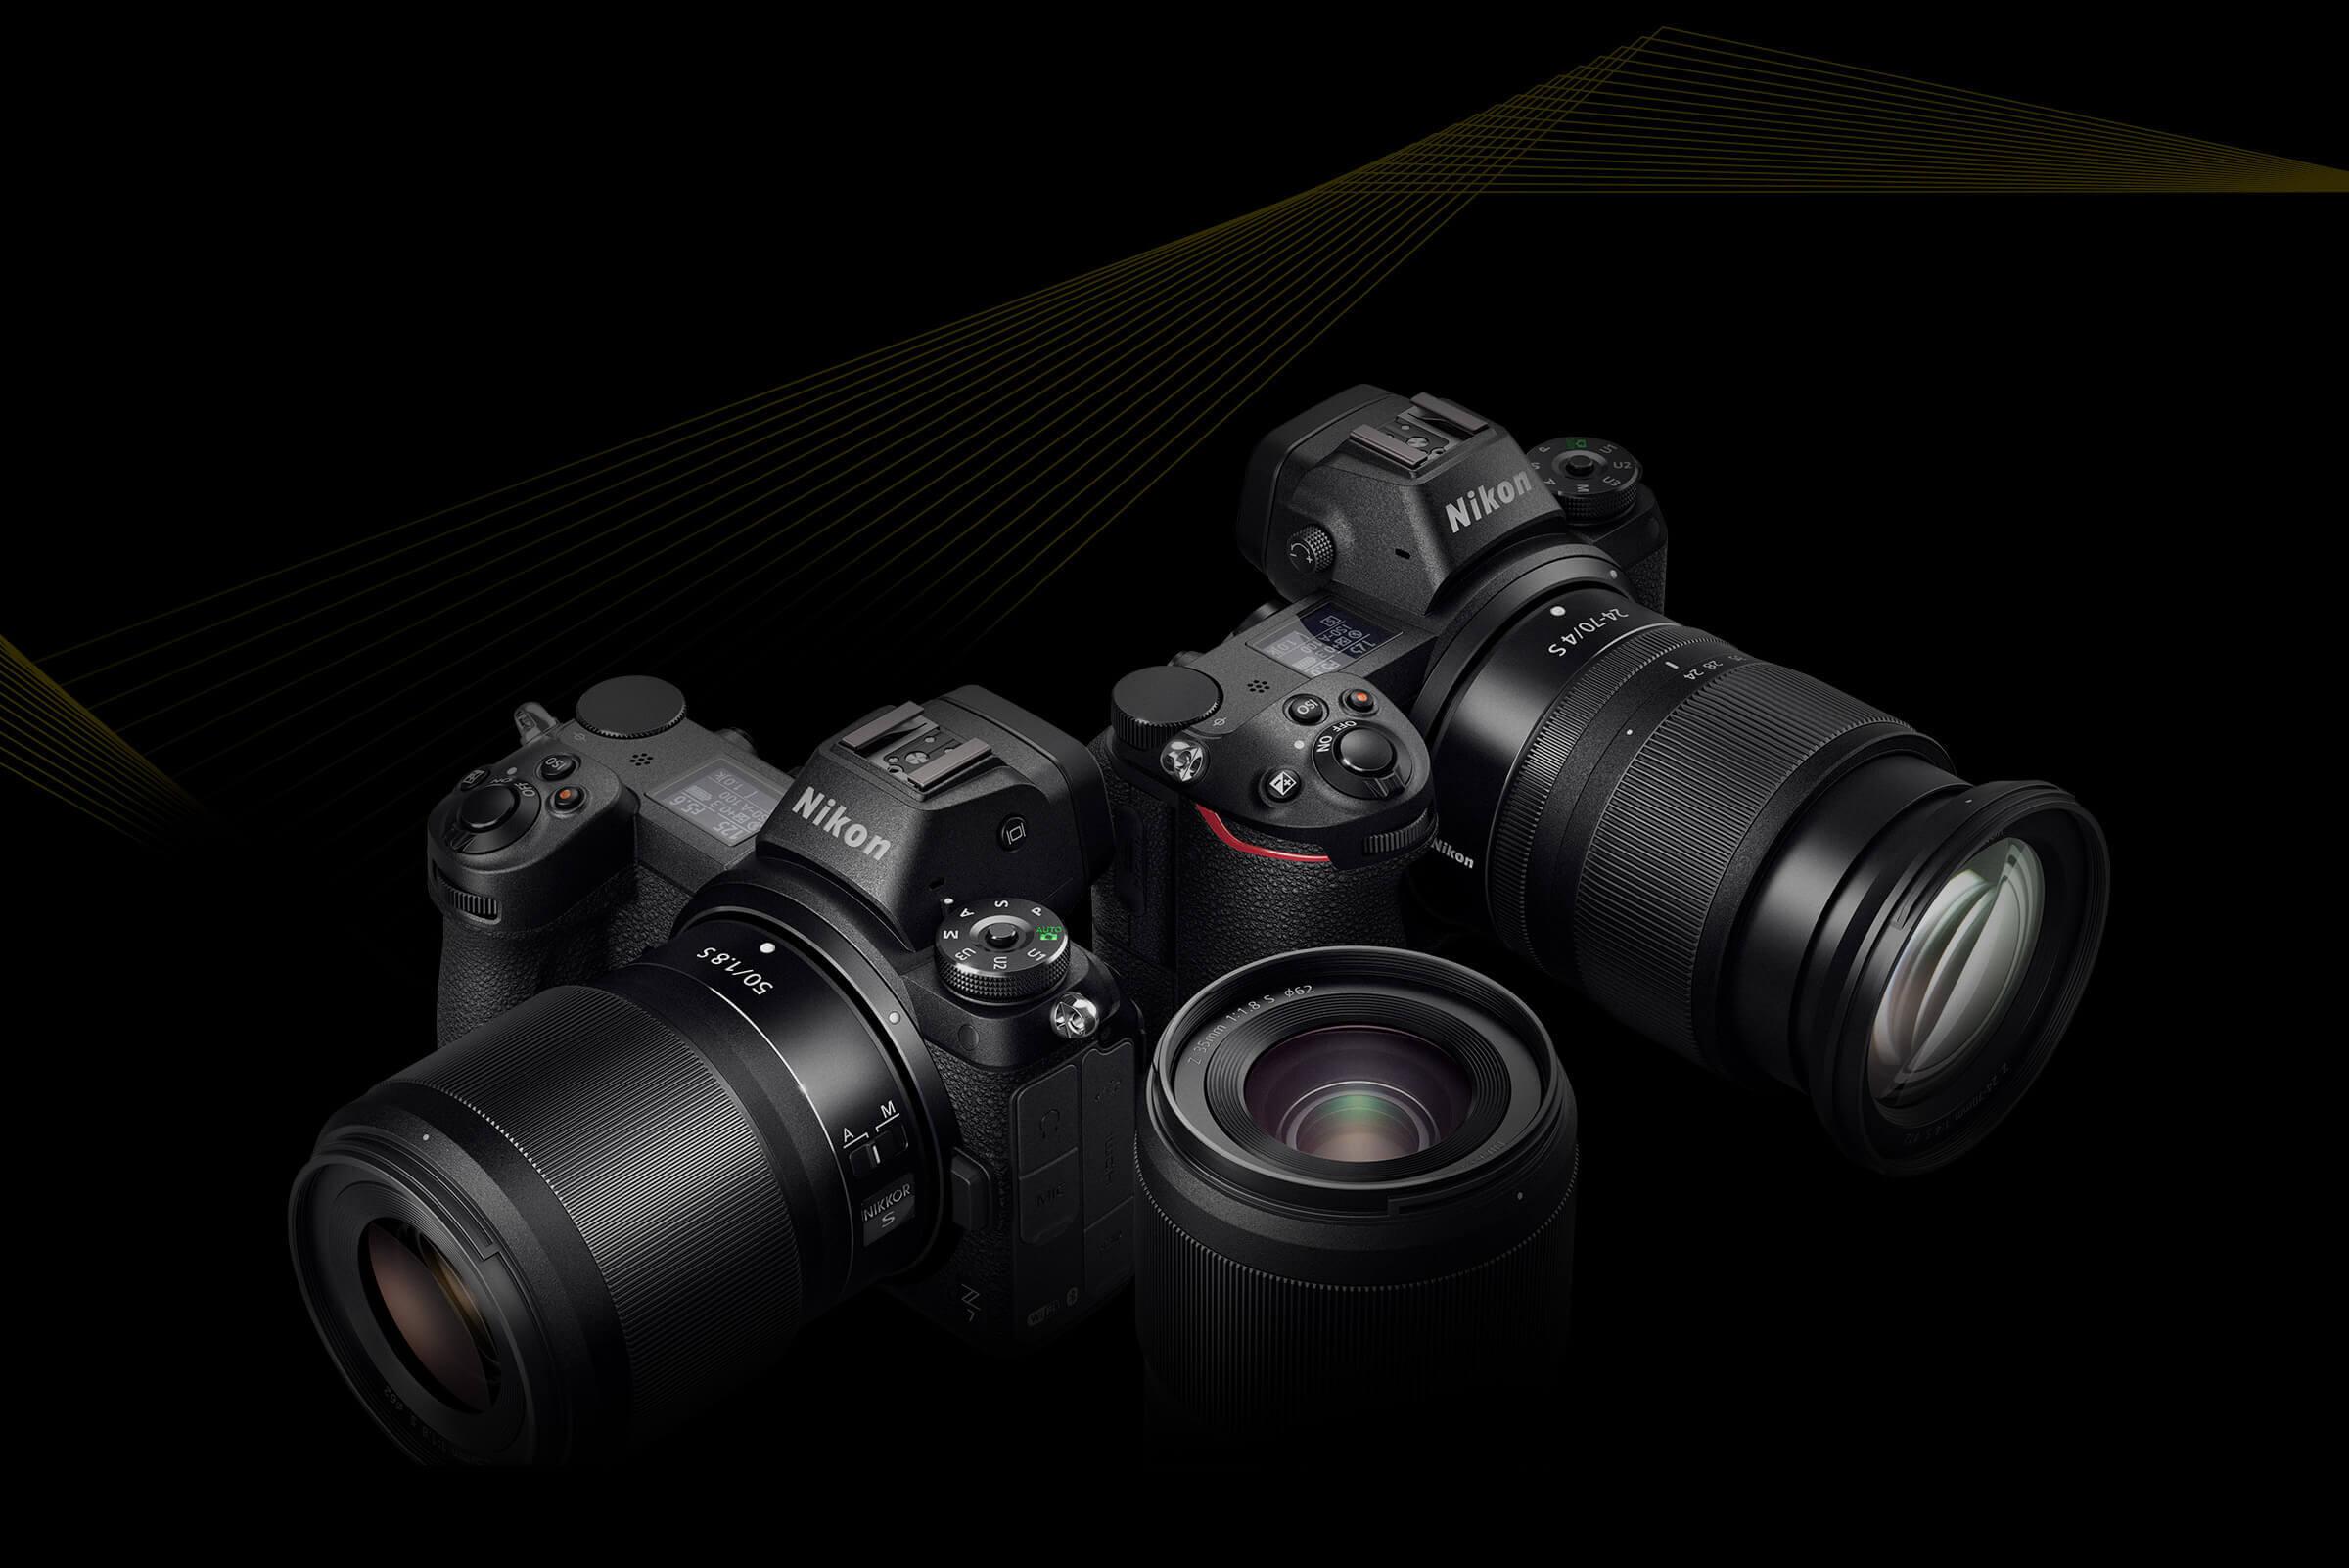 hero bkg xl - Nikon anuncia câmeras mirrorless full-frame com novo sistema Z-mount